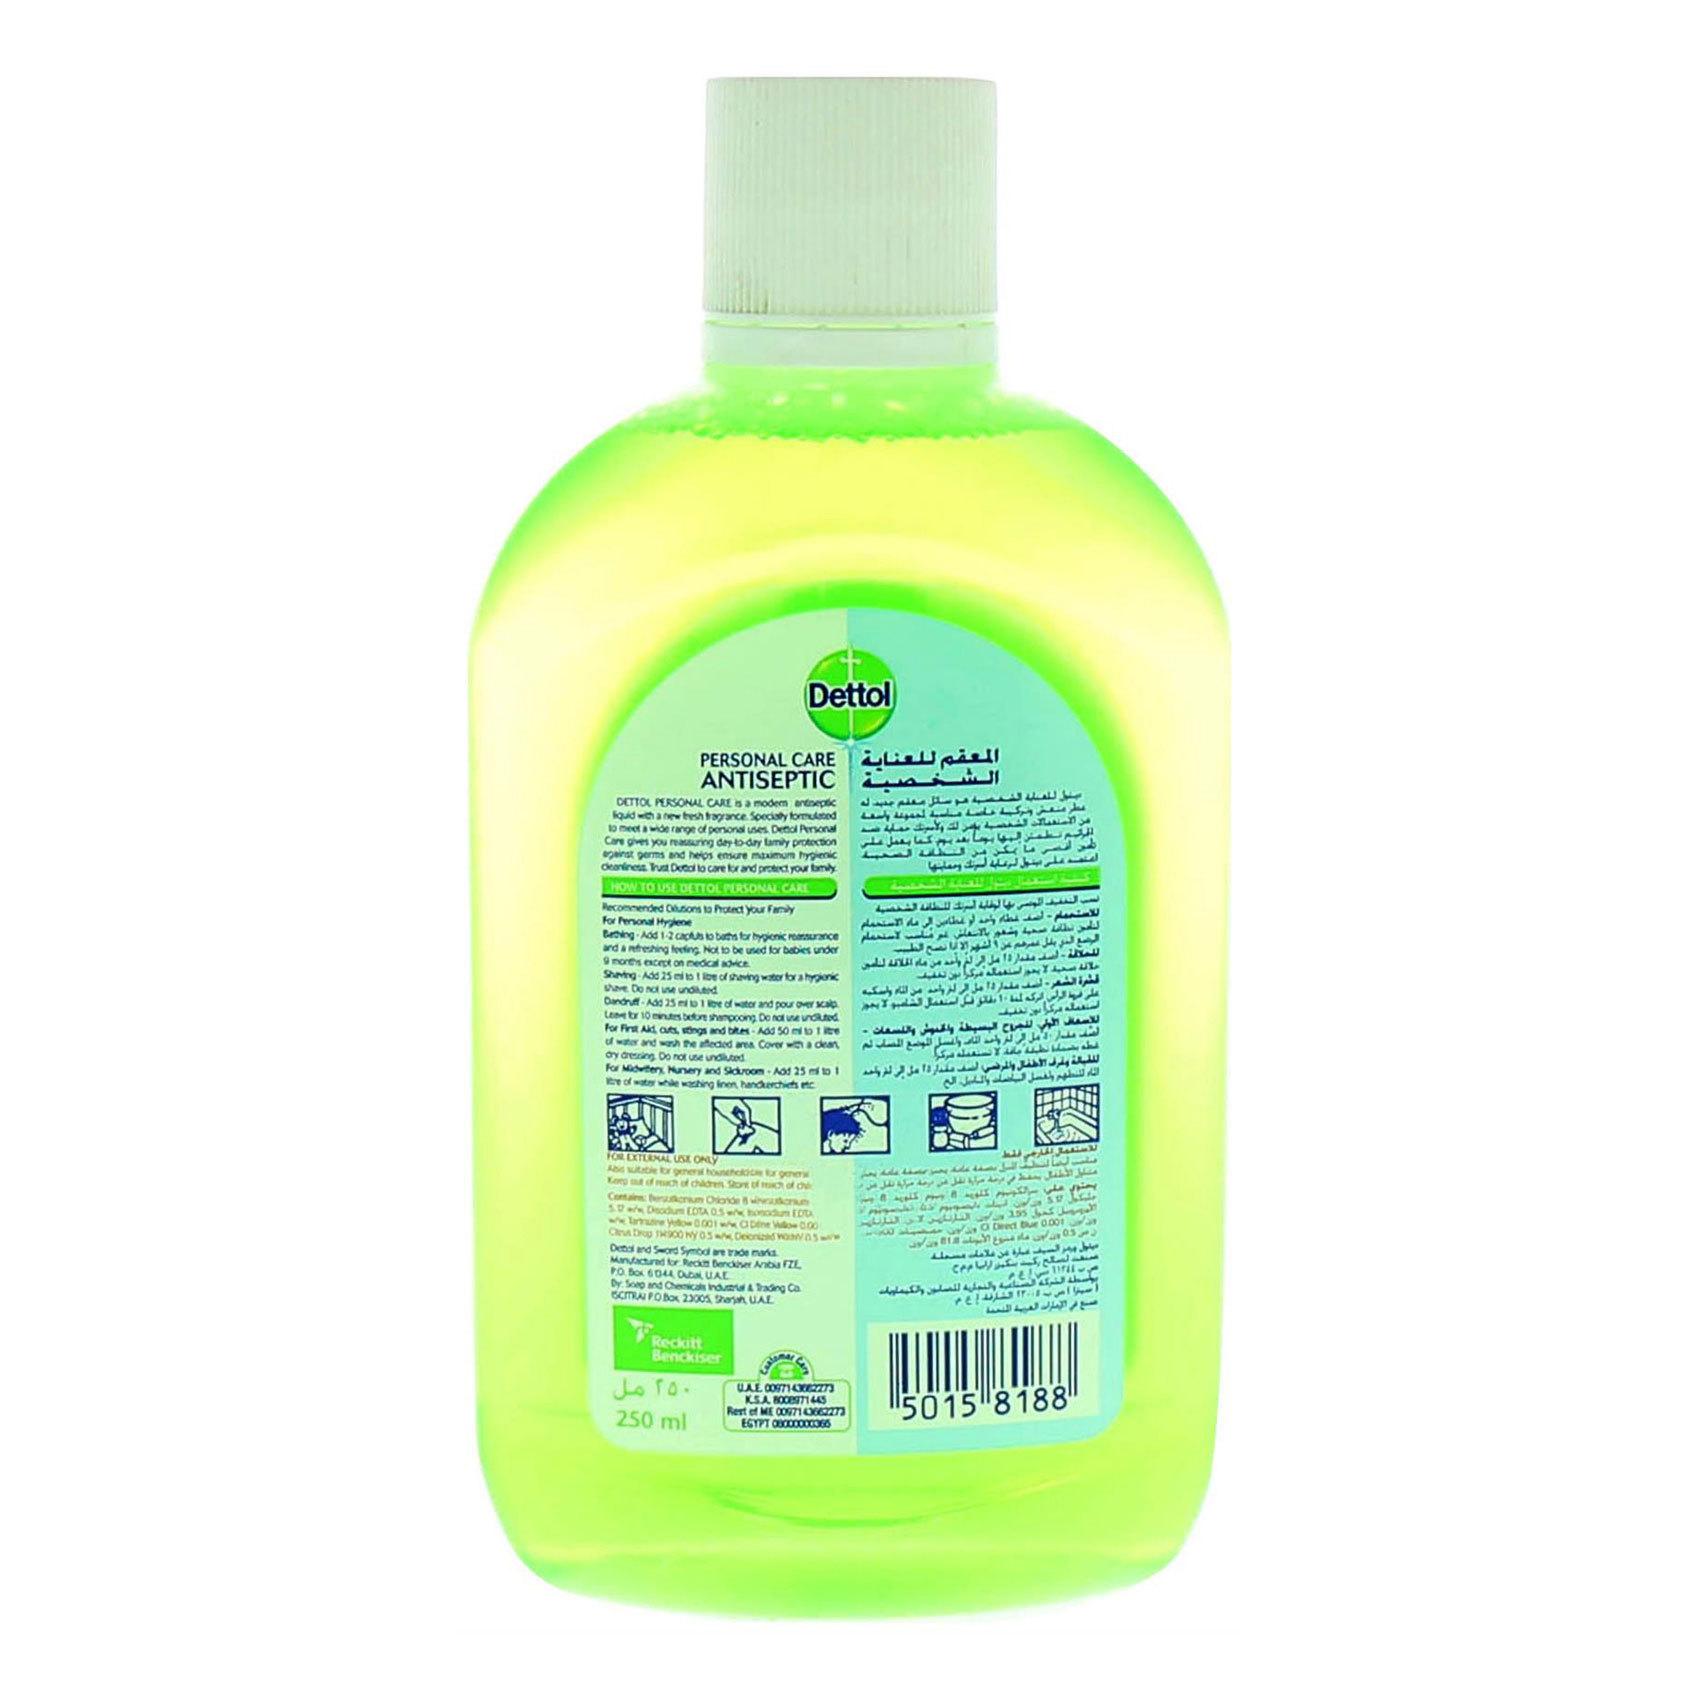 Buy Dettol Anti Bacterial Personal Care Antiseptic 250ml Online In Liquid 100 Ml Antisep